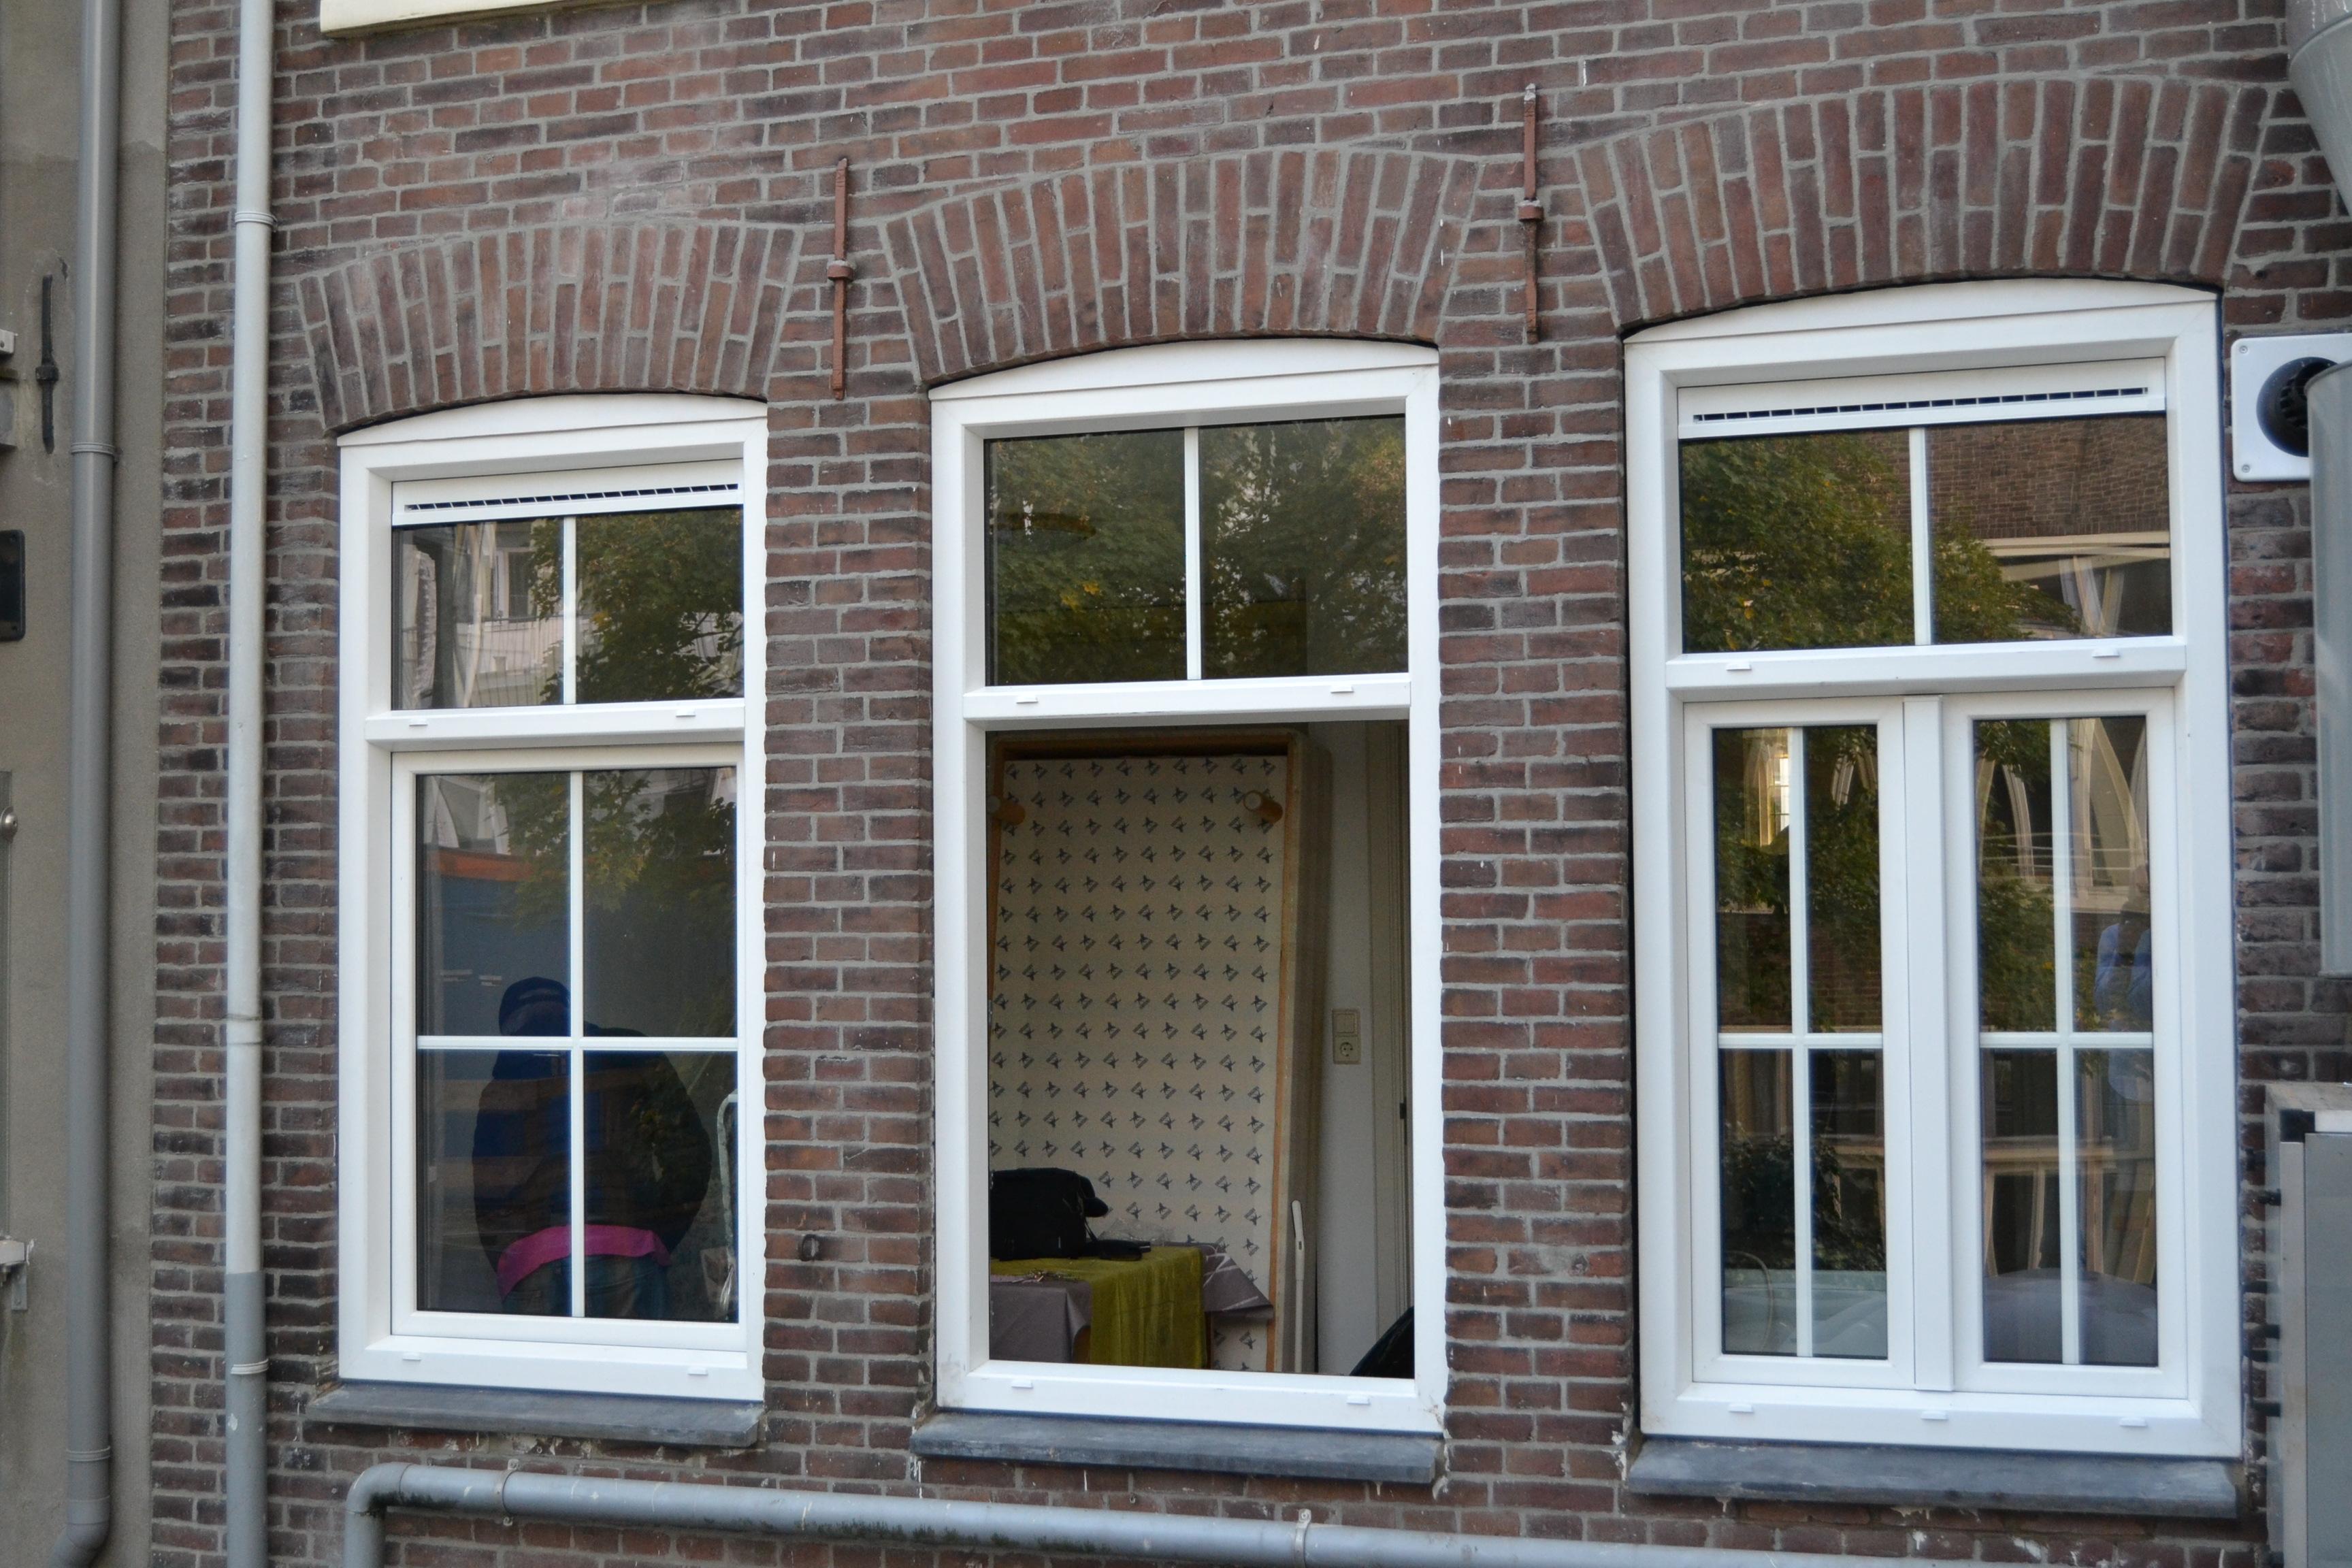 kozijnen vervangen in hartje Amsterdam (grachtenpand)